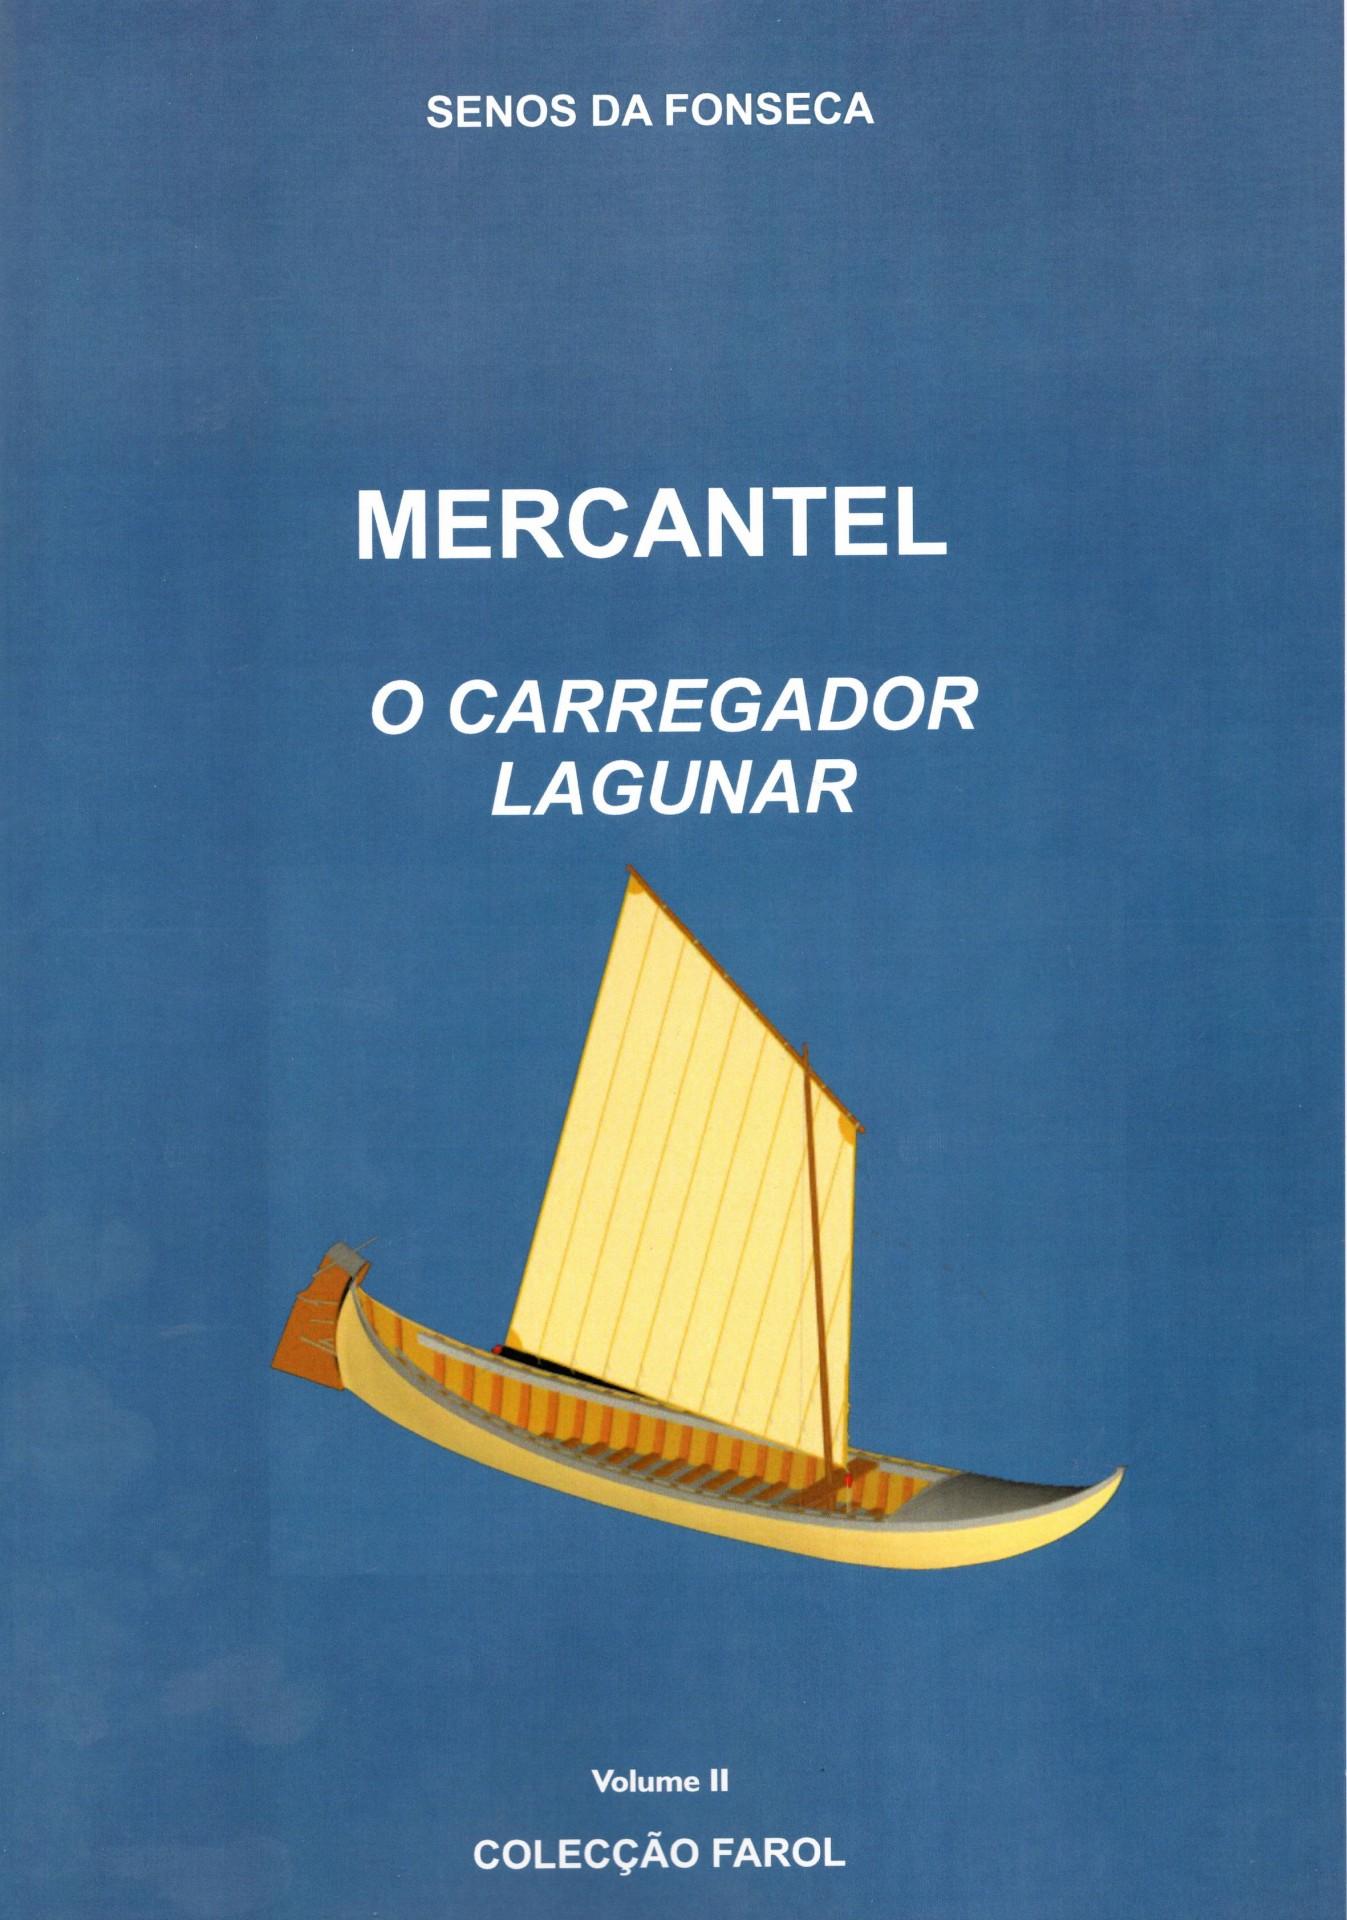 Mercantel